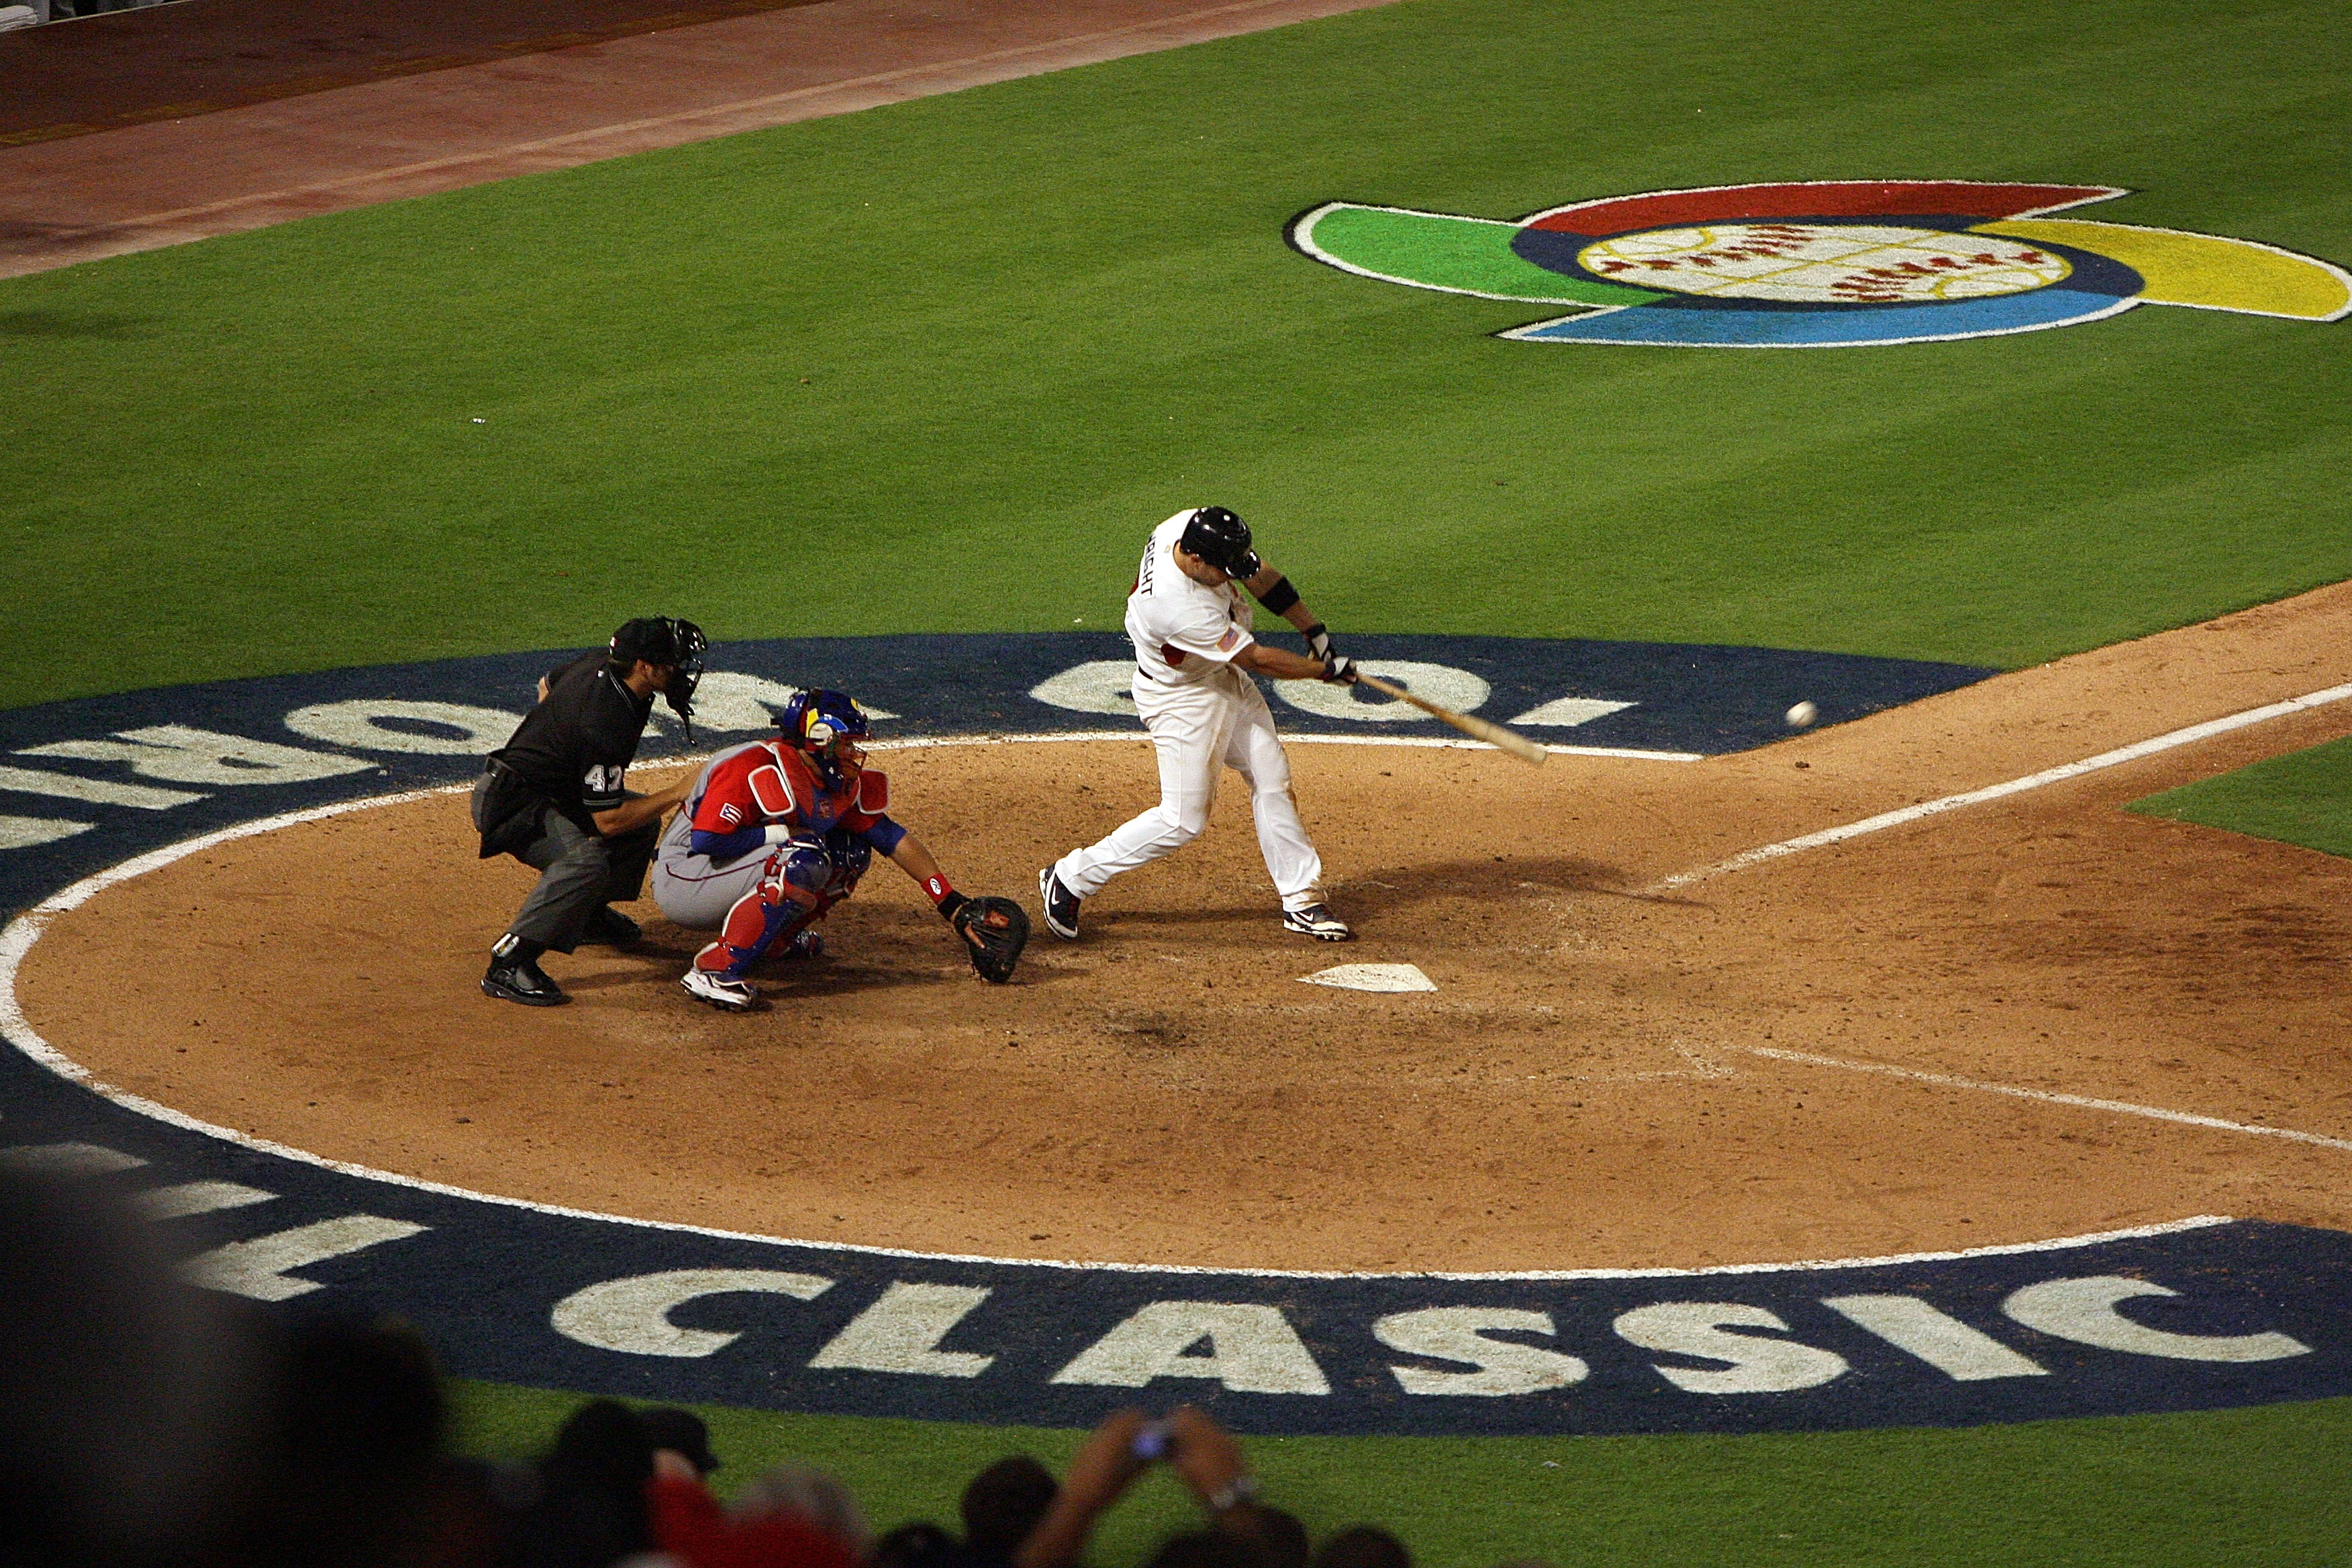 World Baseball Classic 2009 - Puerto Rico v United States